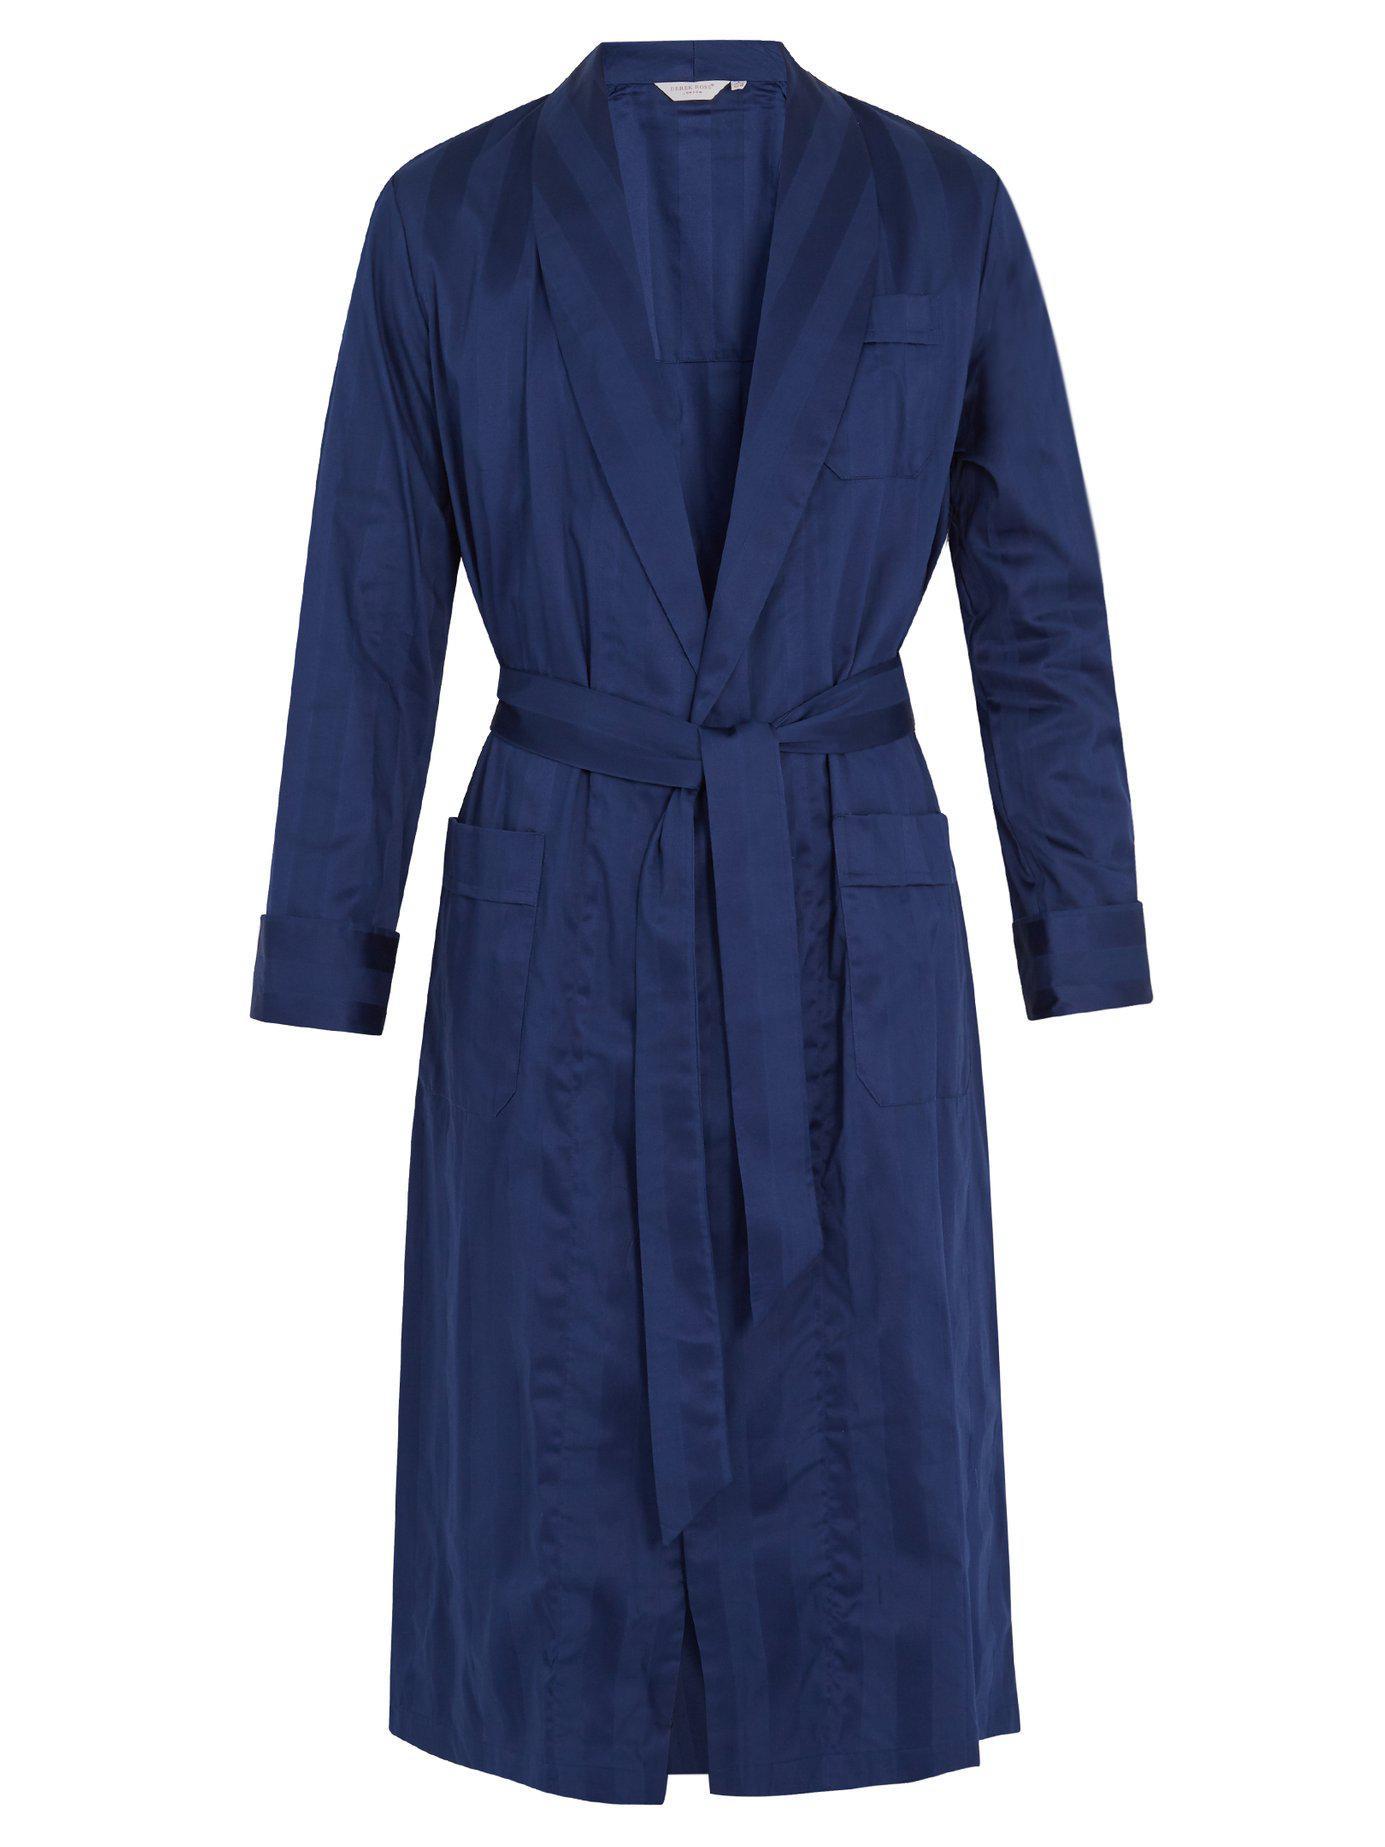 Lyst - Derek Rose Lingfield Cotton Striped Bathrobe in Blue for Men 796da2f77